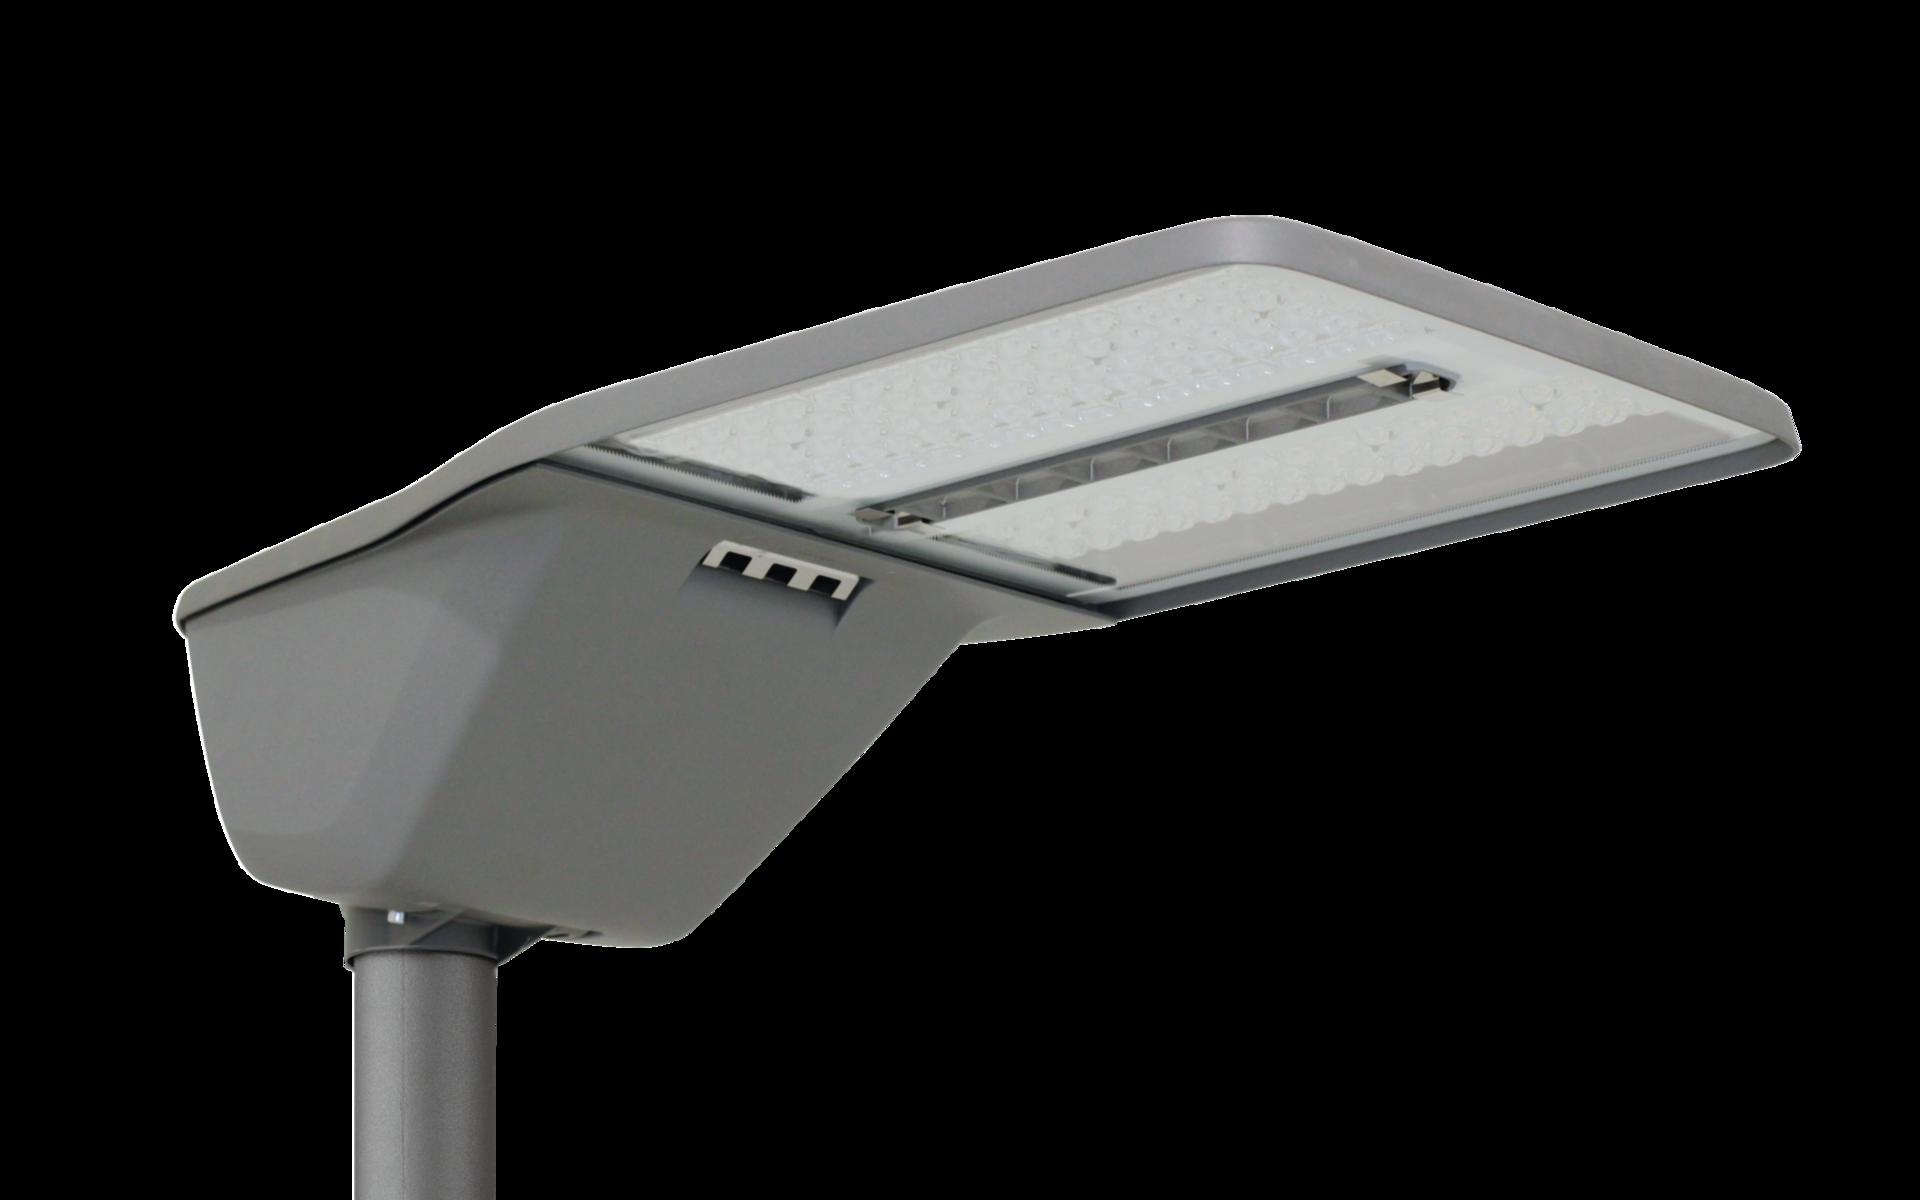 sielight-lightning-proionta-streetlight-20-maxi